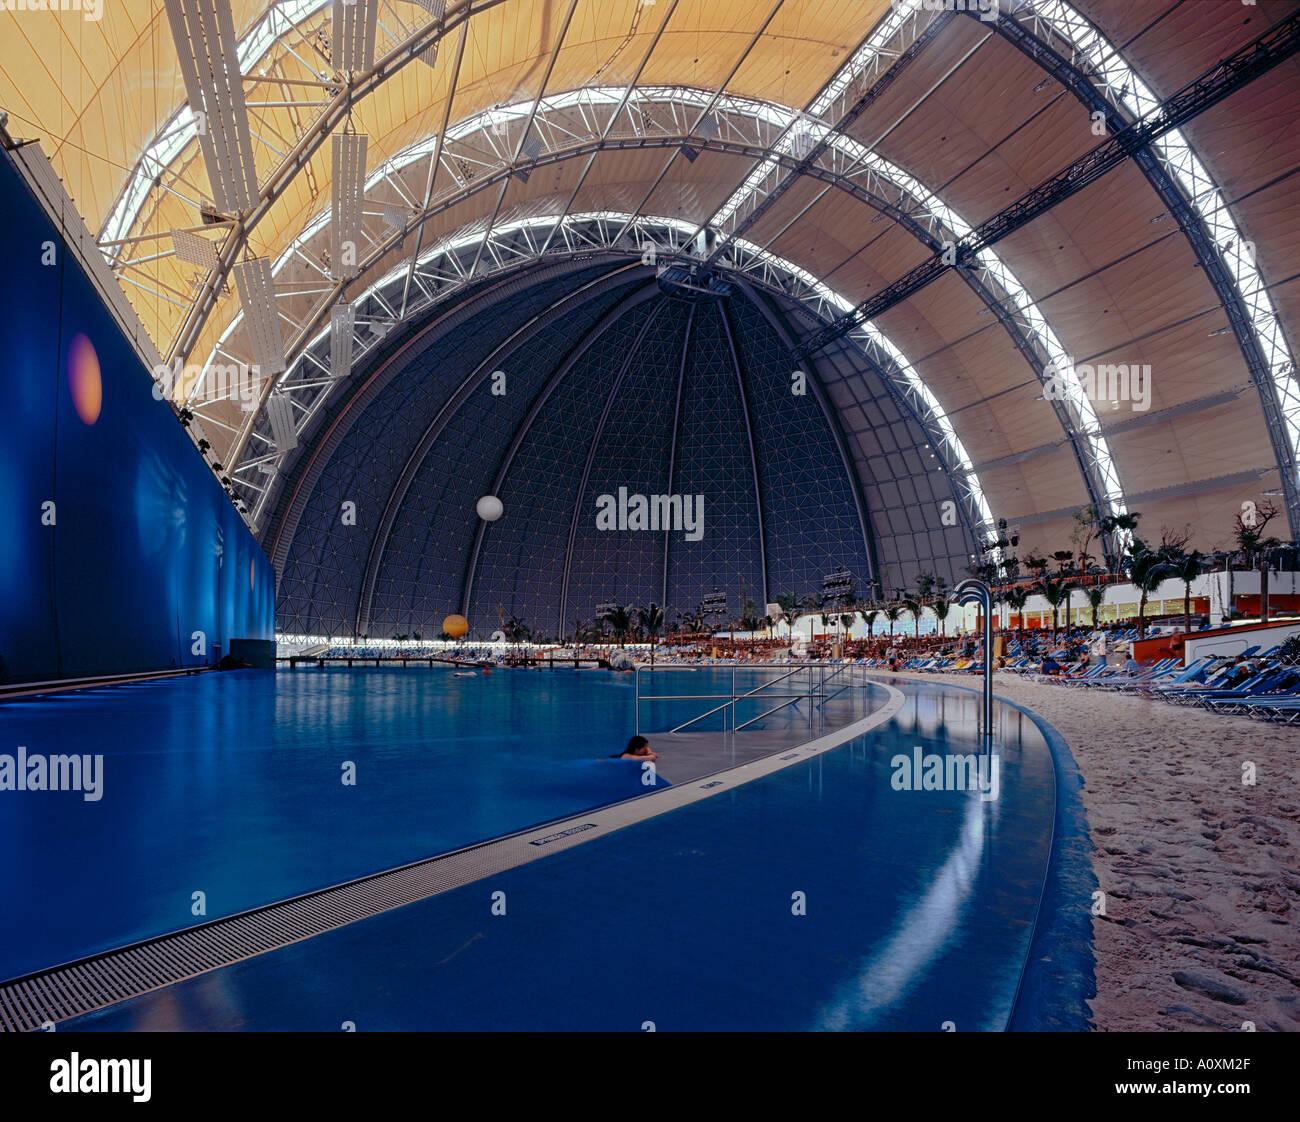 parc aquatique krausnick